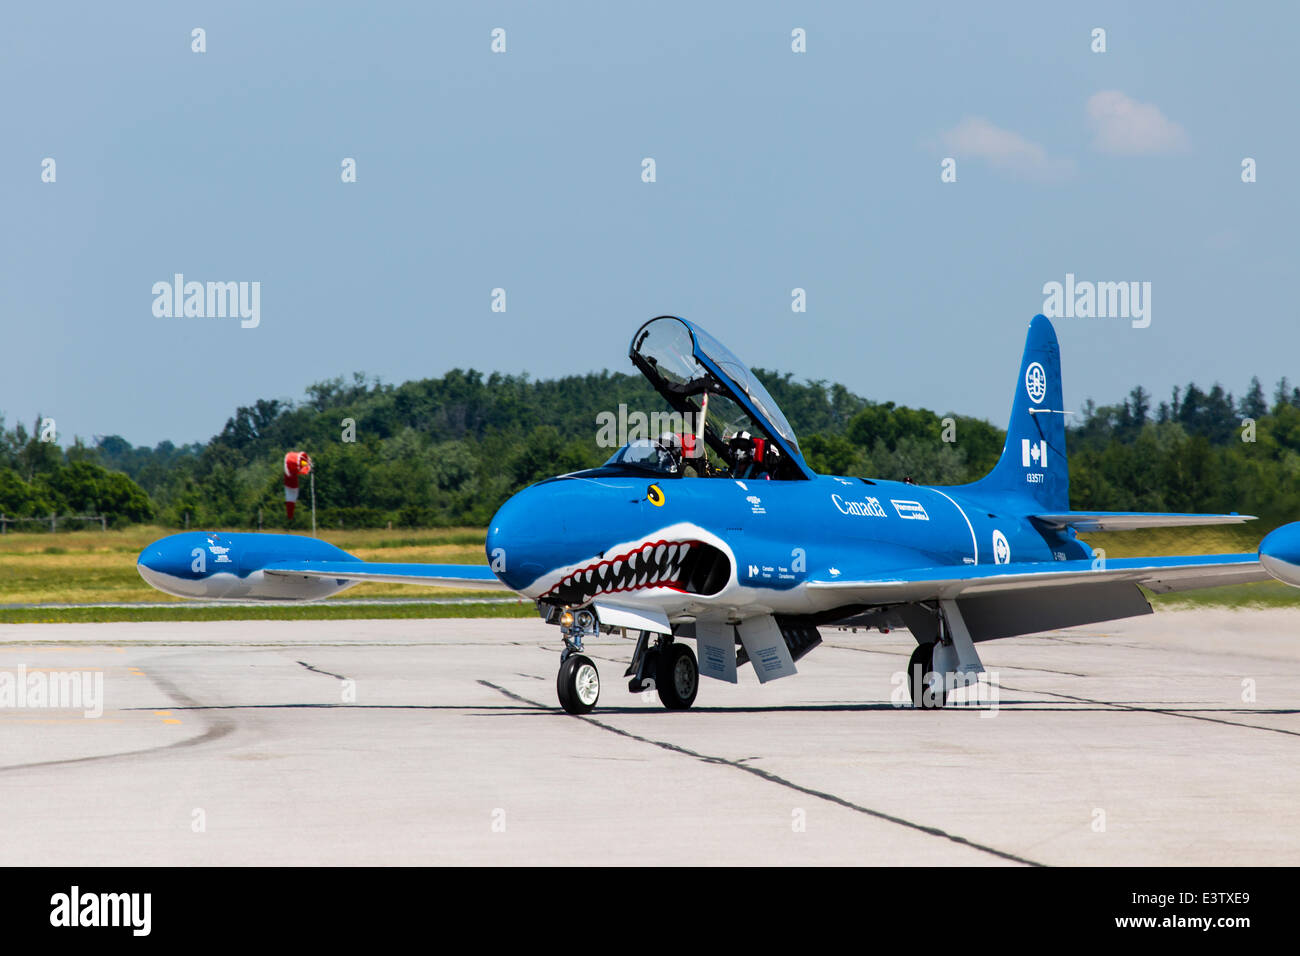 Waterloo, Ontario, Canada. 27th June, 2014. T-33 Silver Star Mako ...